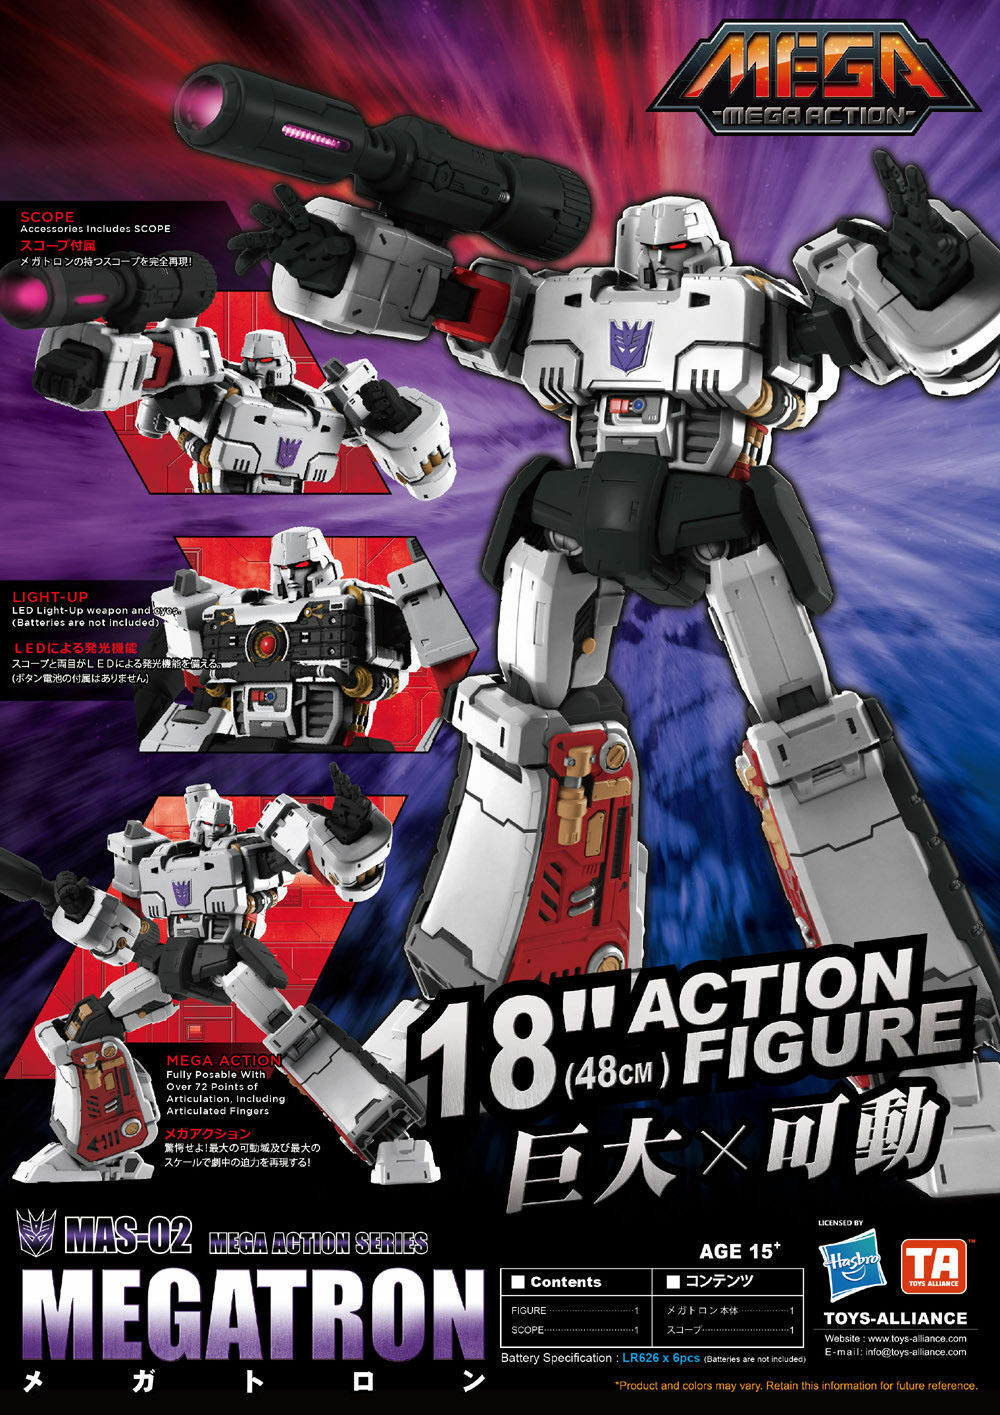 Roboter transformers megatron spielzeug allianz mega - aktion mas-02 decepticon - 19 11